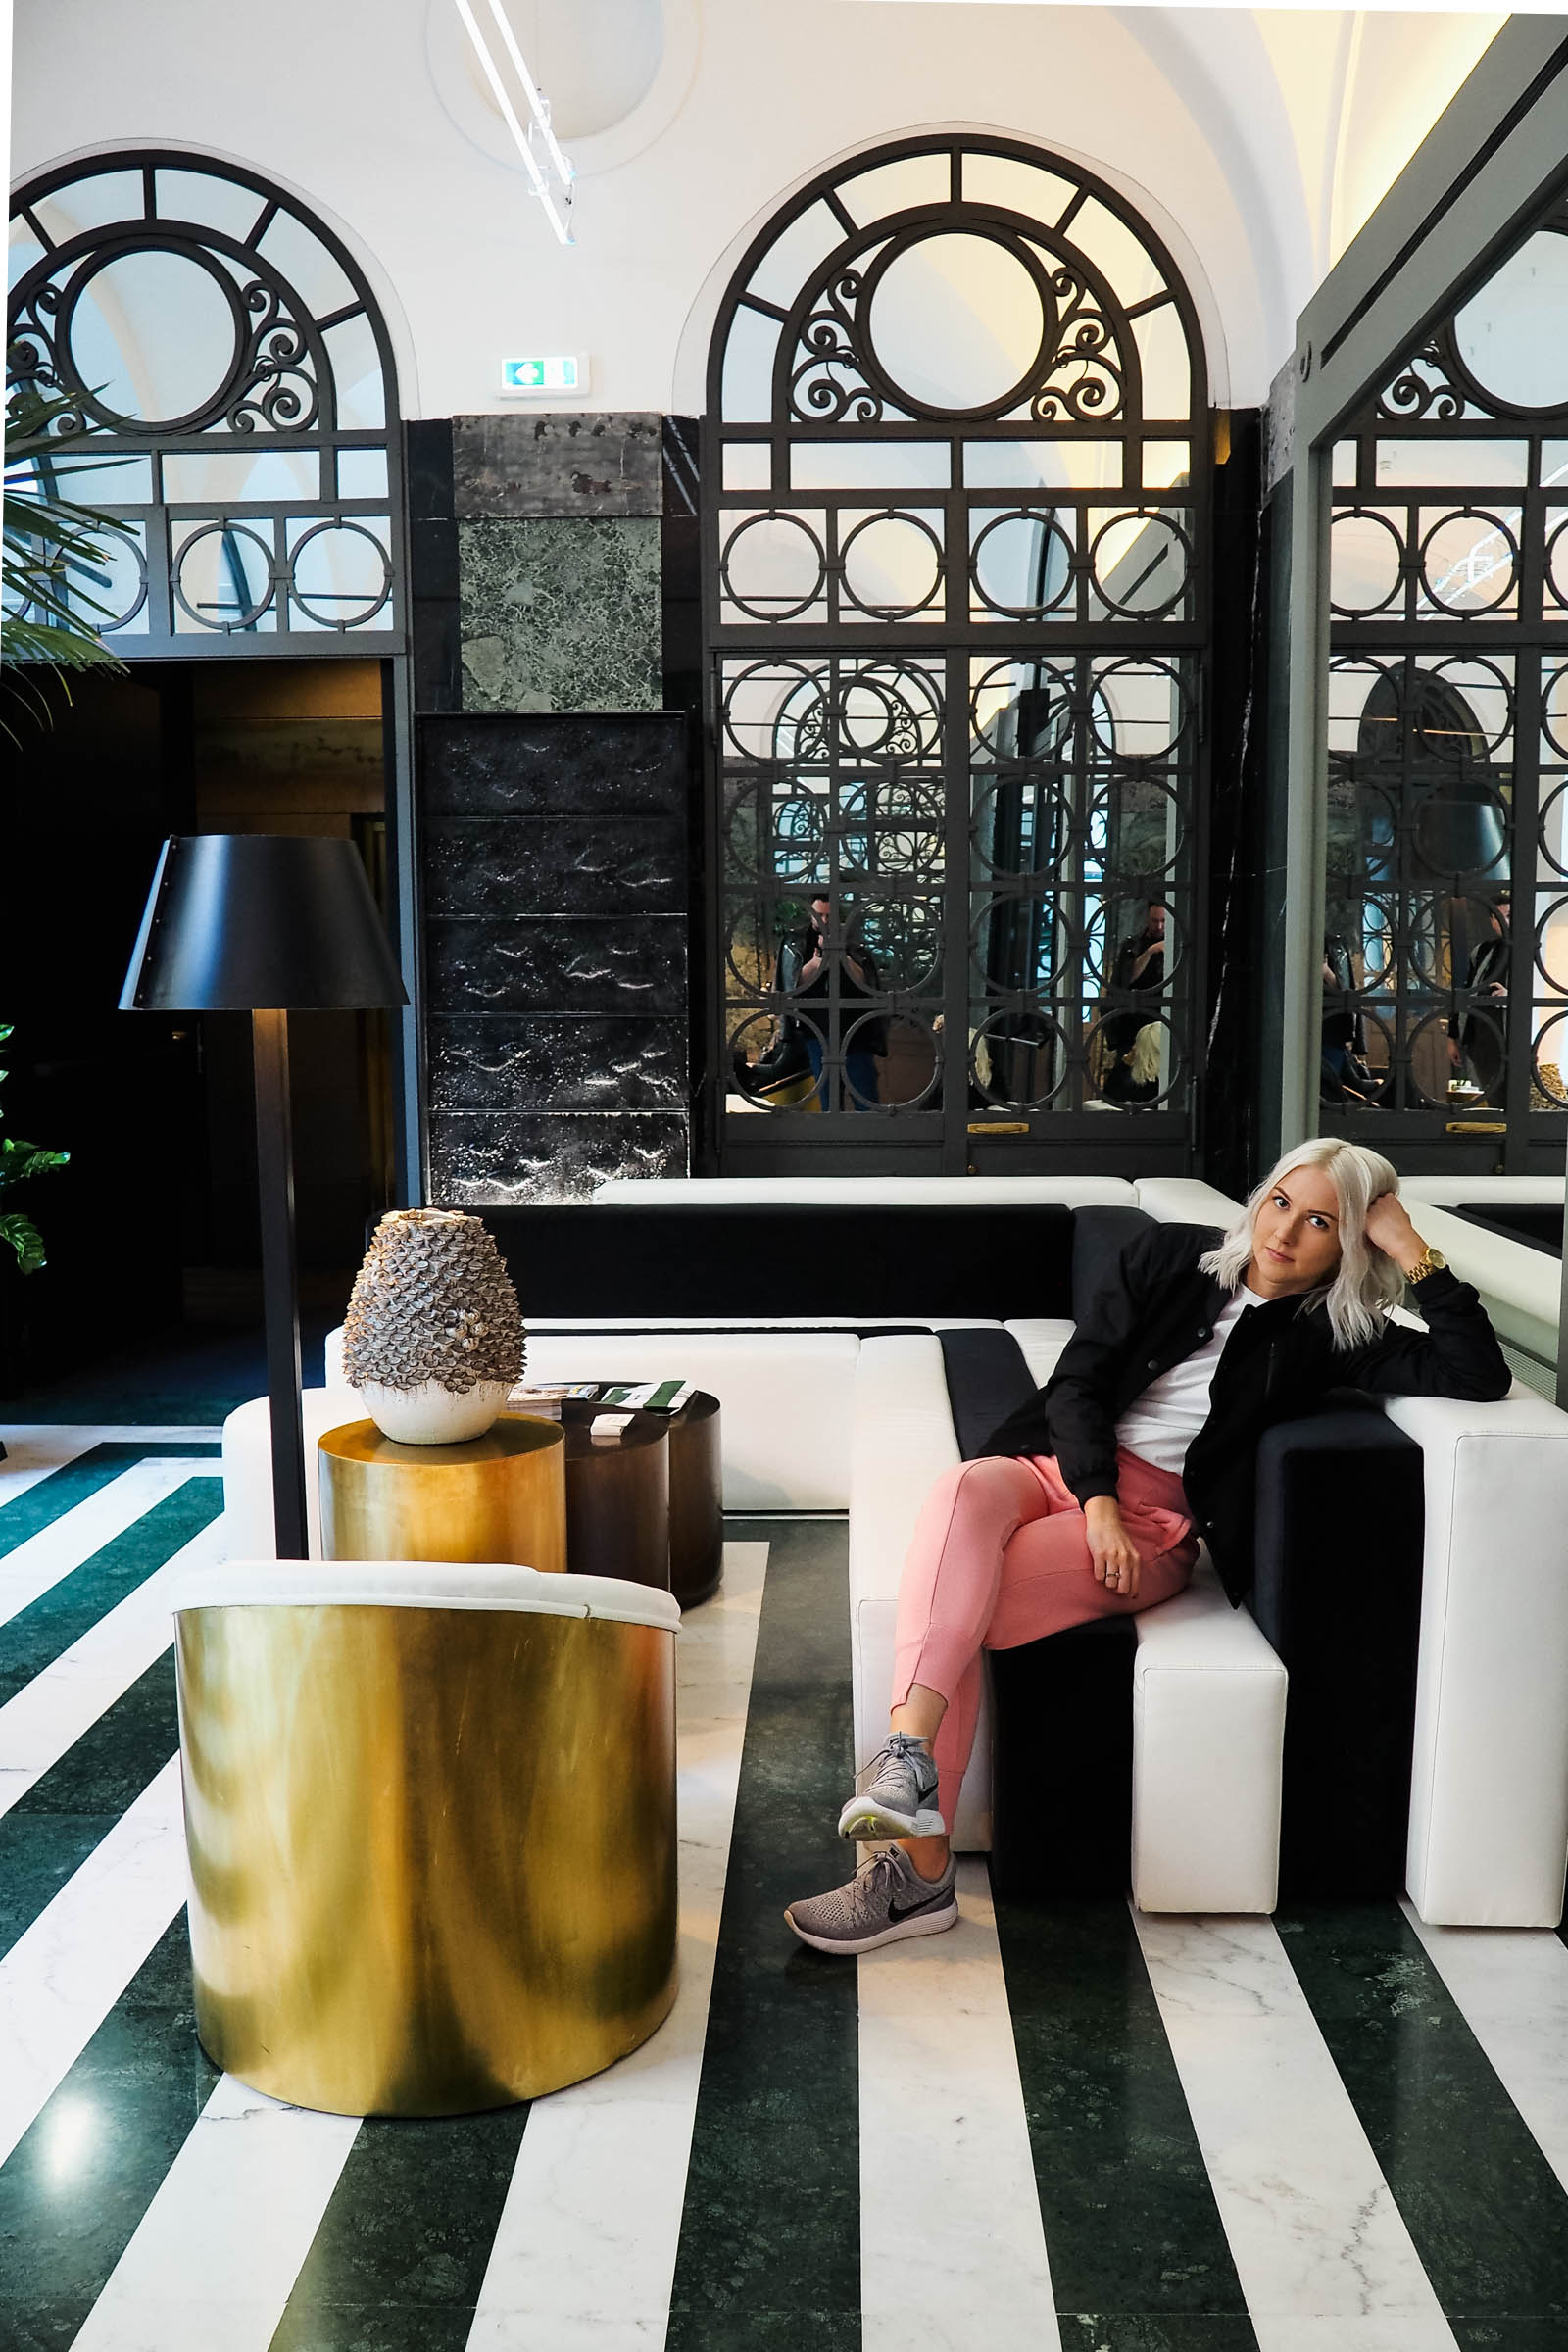 SARAH akwisombe at the Senato Hotel milan